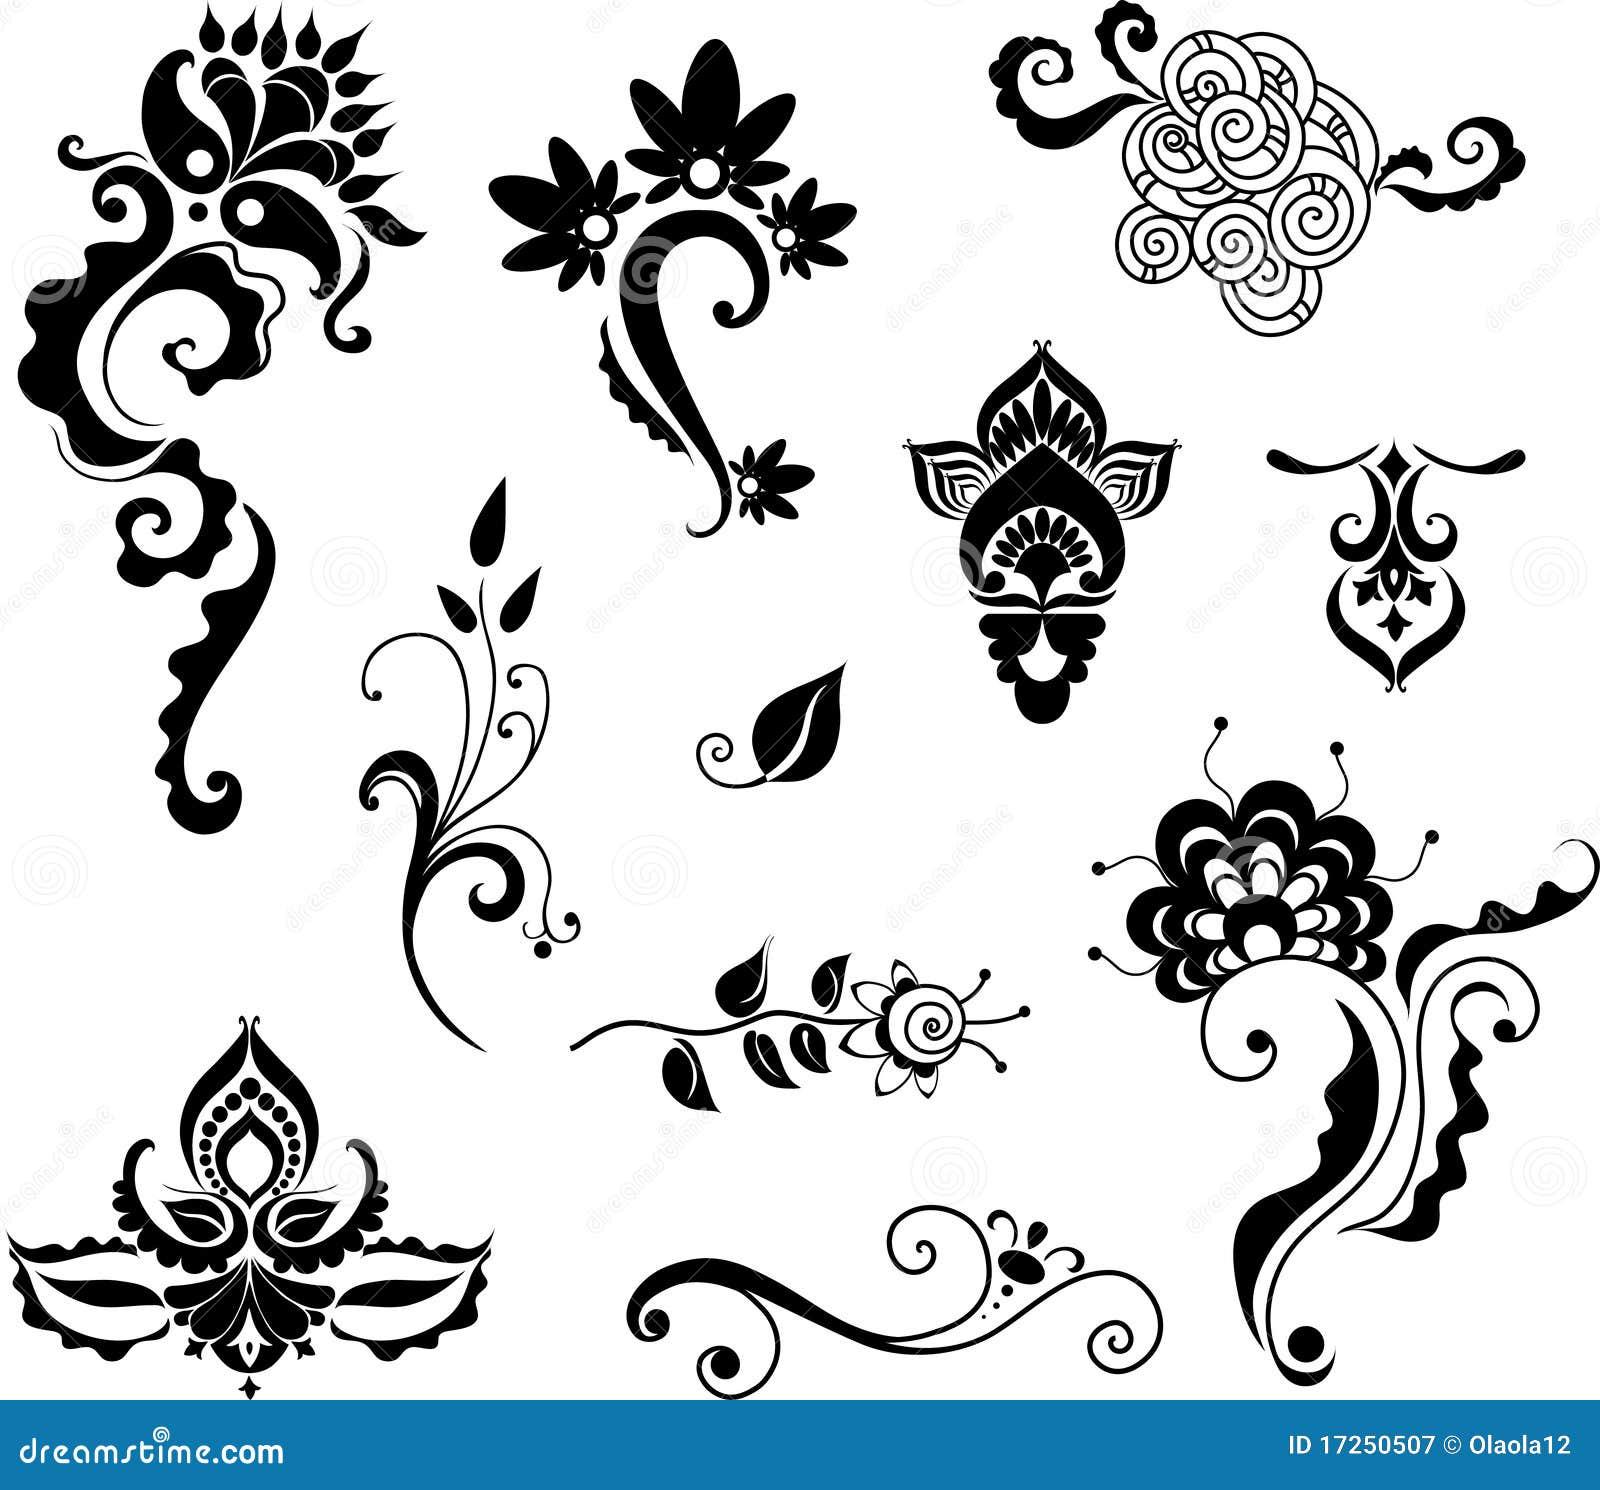 Disegni per decorare ub76 regardsdefemmes - Decorazioni floreali per pareti ...